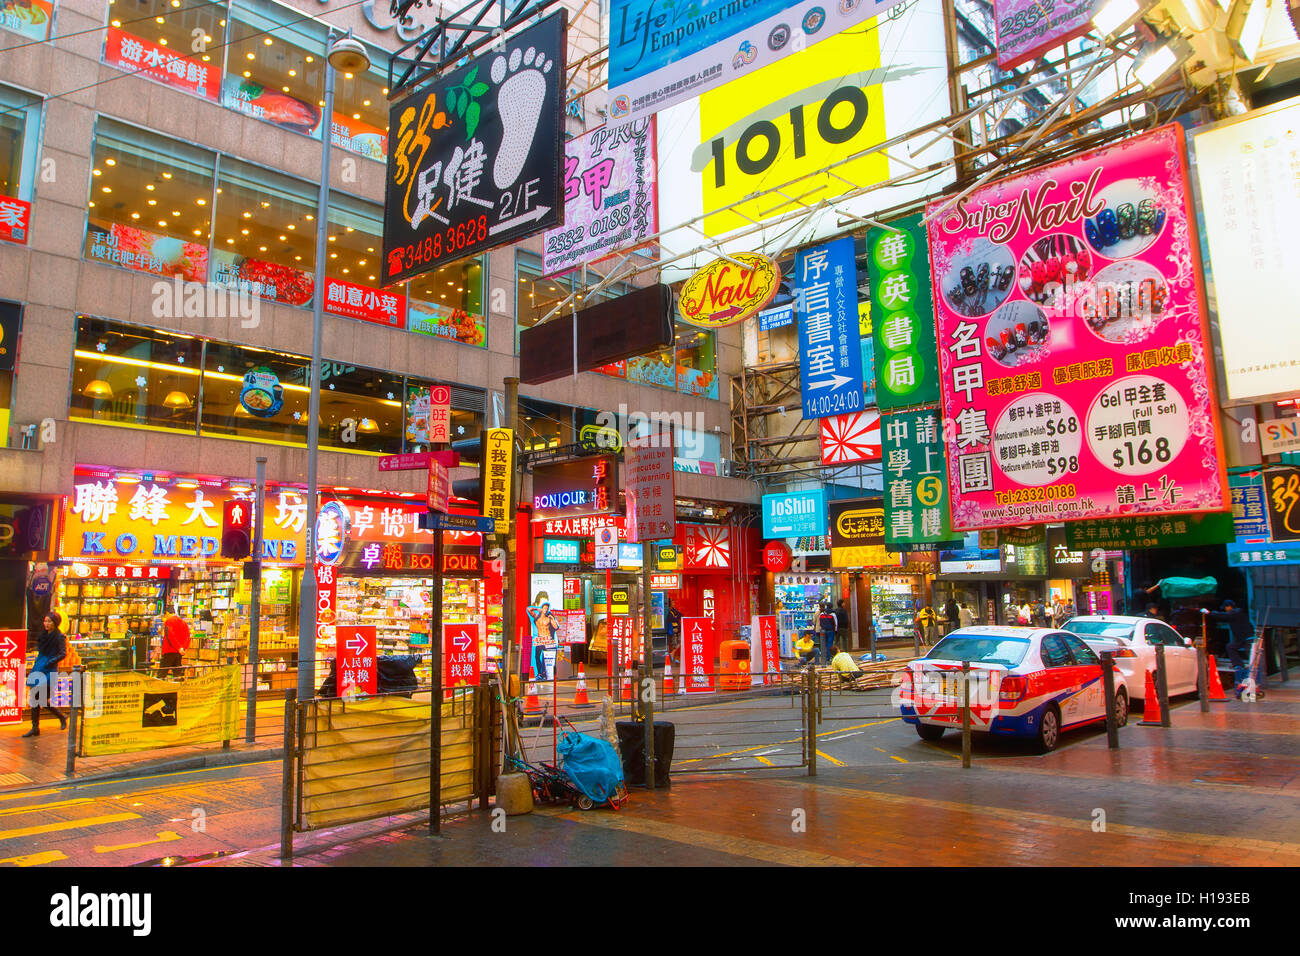 Street scene in Kowloon, Hong Kong - Stock Image